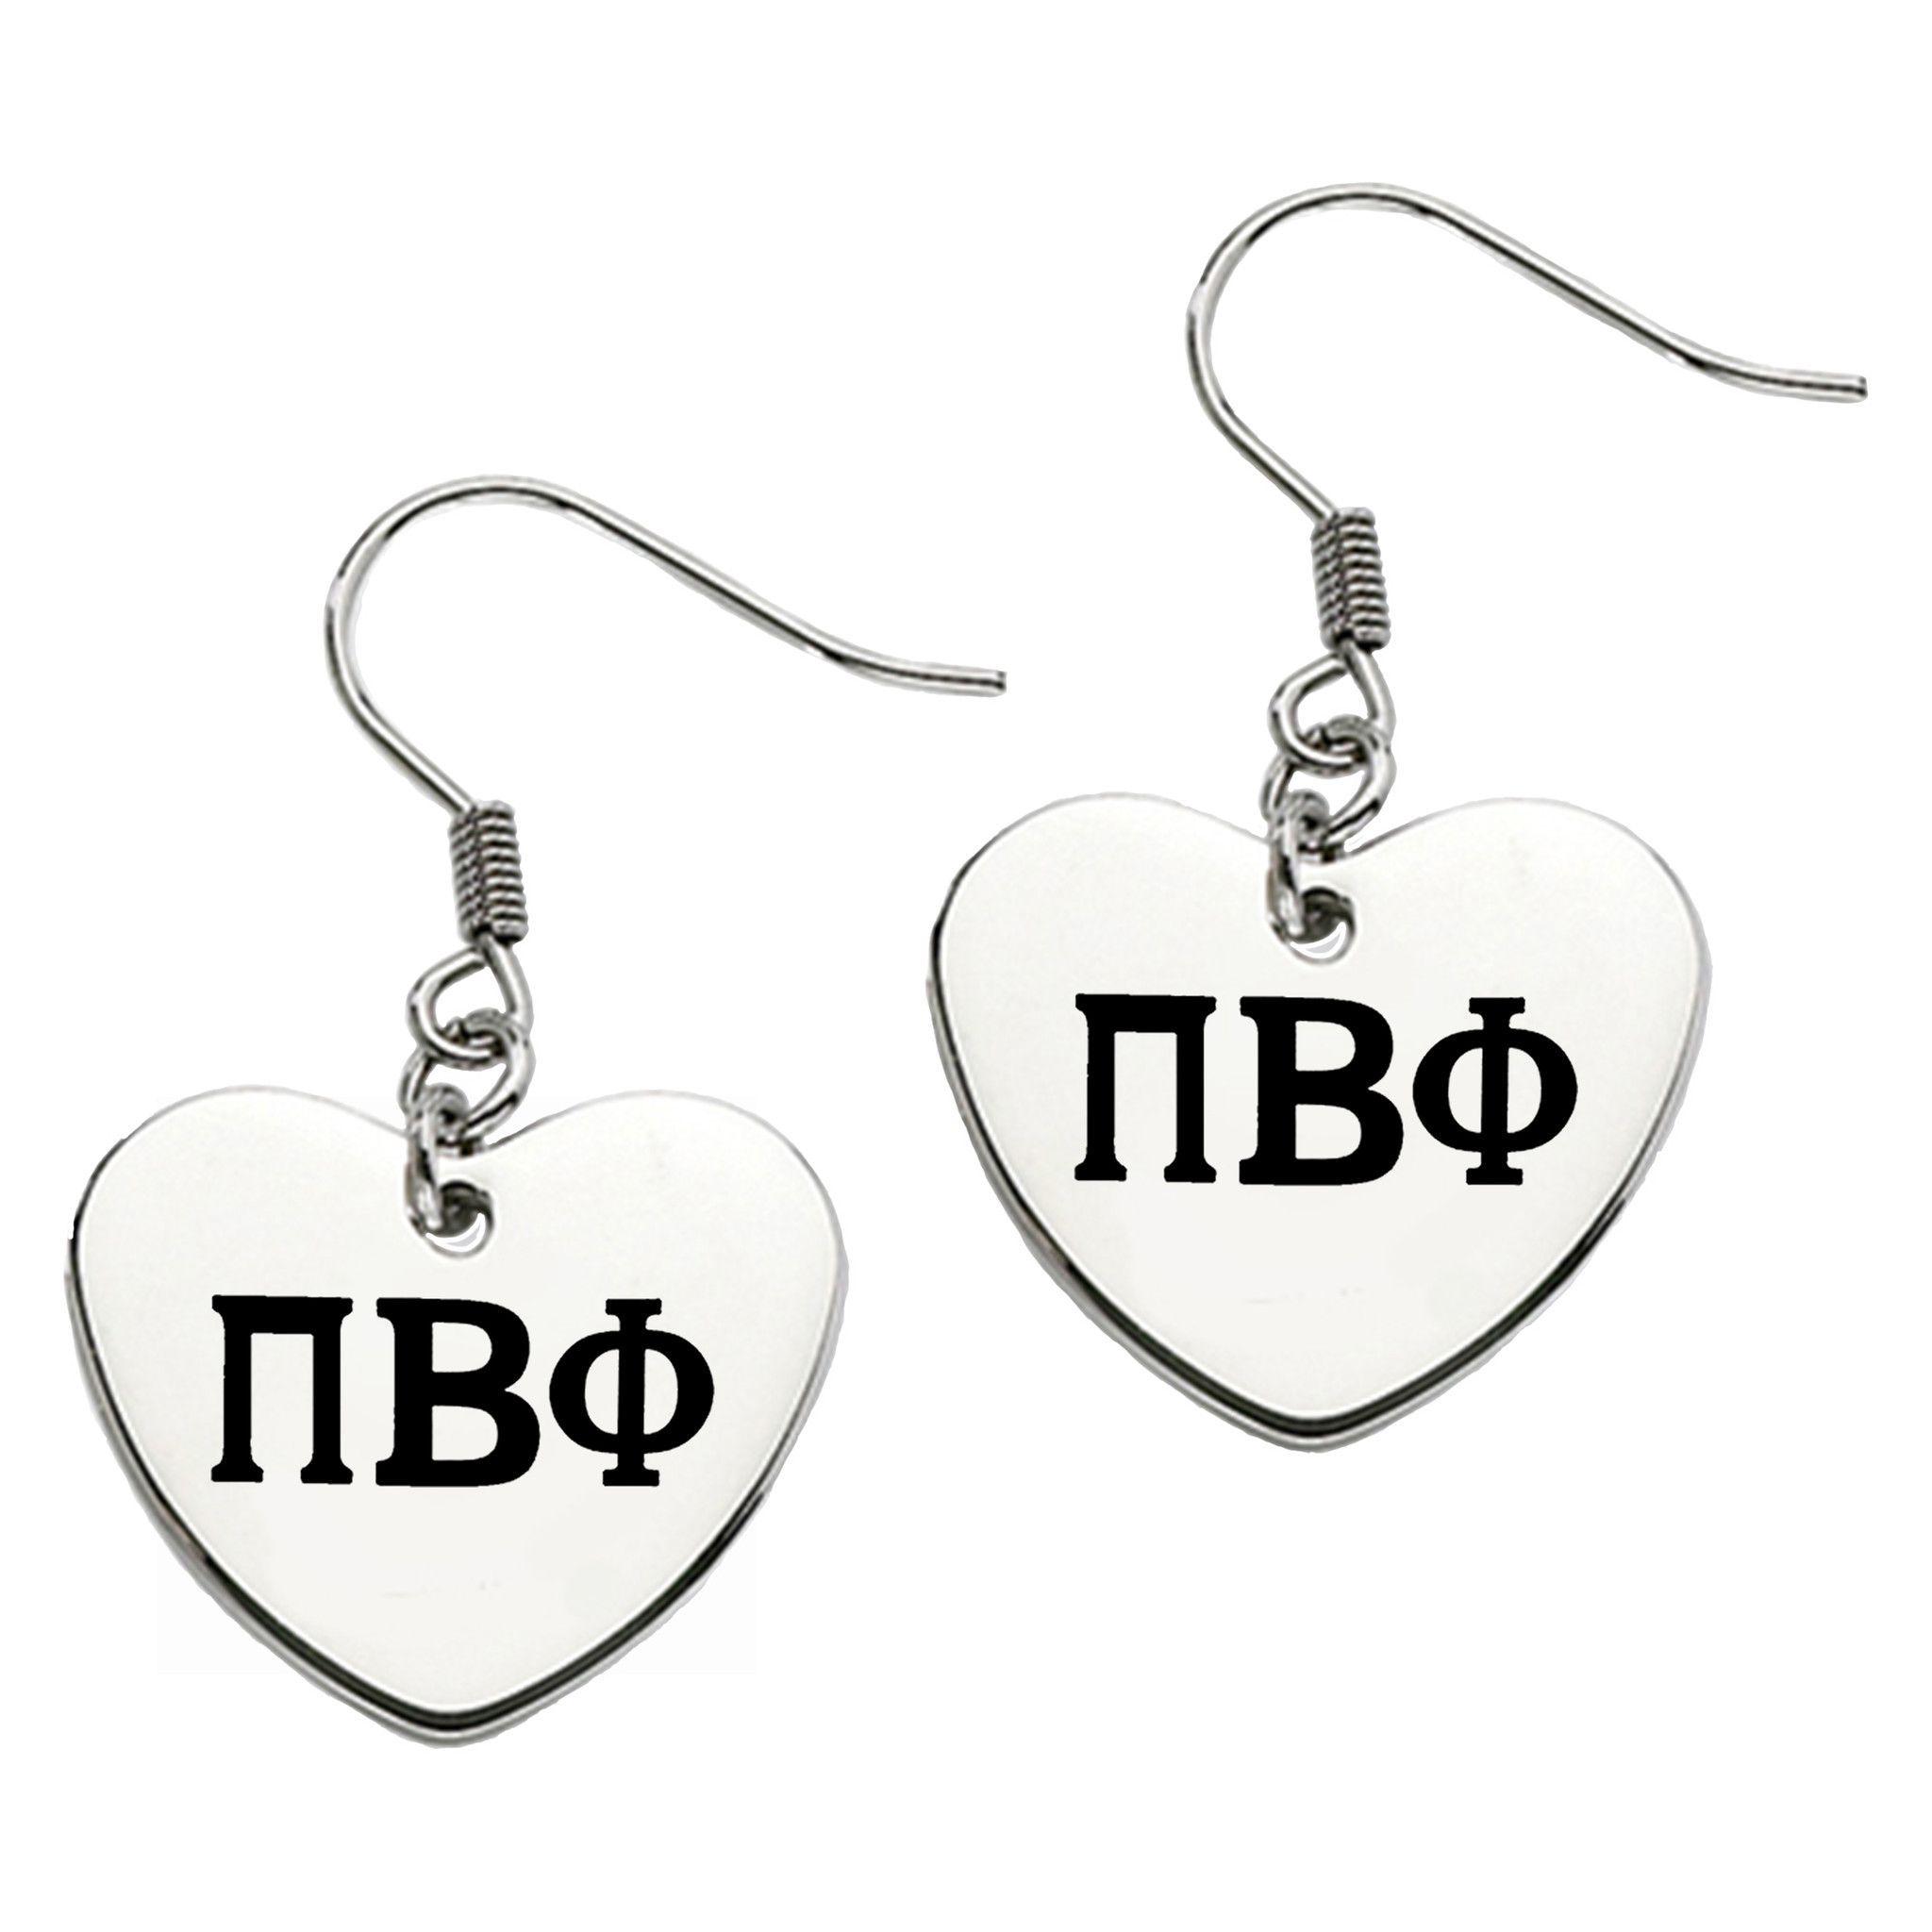 Pi beta phi greek letters heart shape drop earrings drop pi beta phi greek letters heart shape drop earrings biocorpaavc Image collections